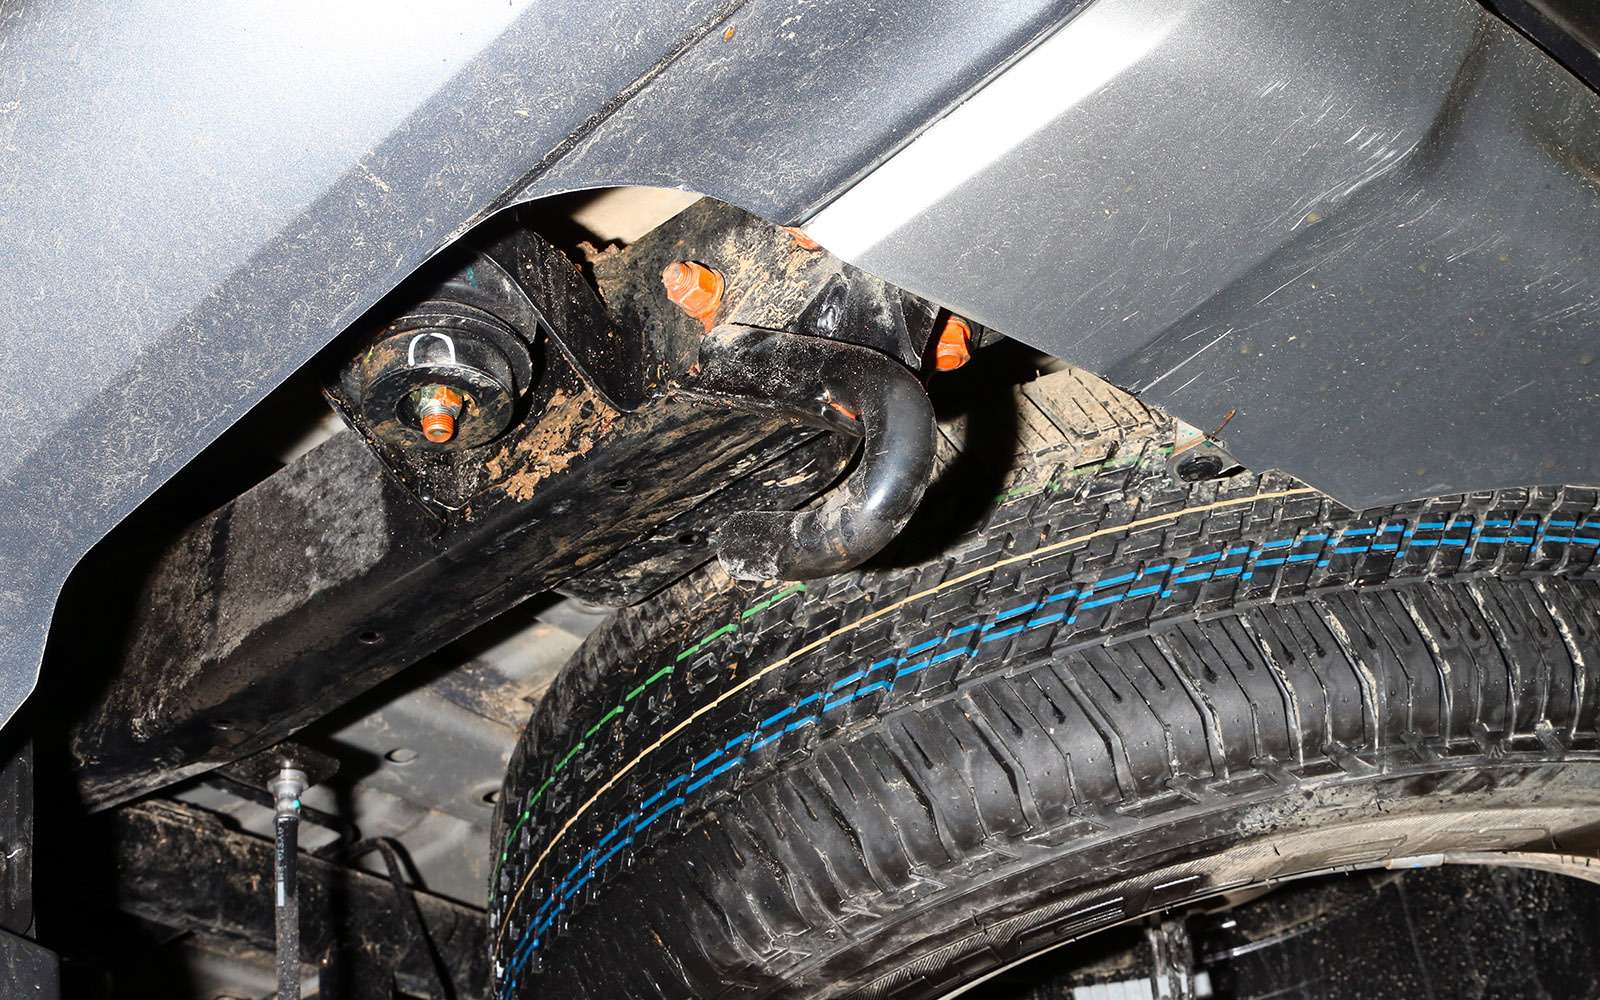 Mitsubishi Pajero Sport иKia Mohave— сравнительный тест настоящих внедорожников— фото 769878